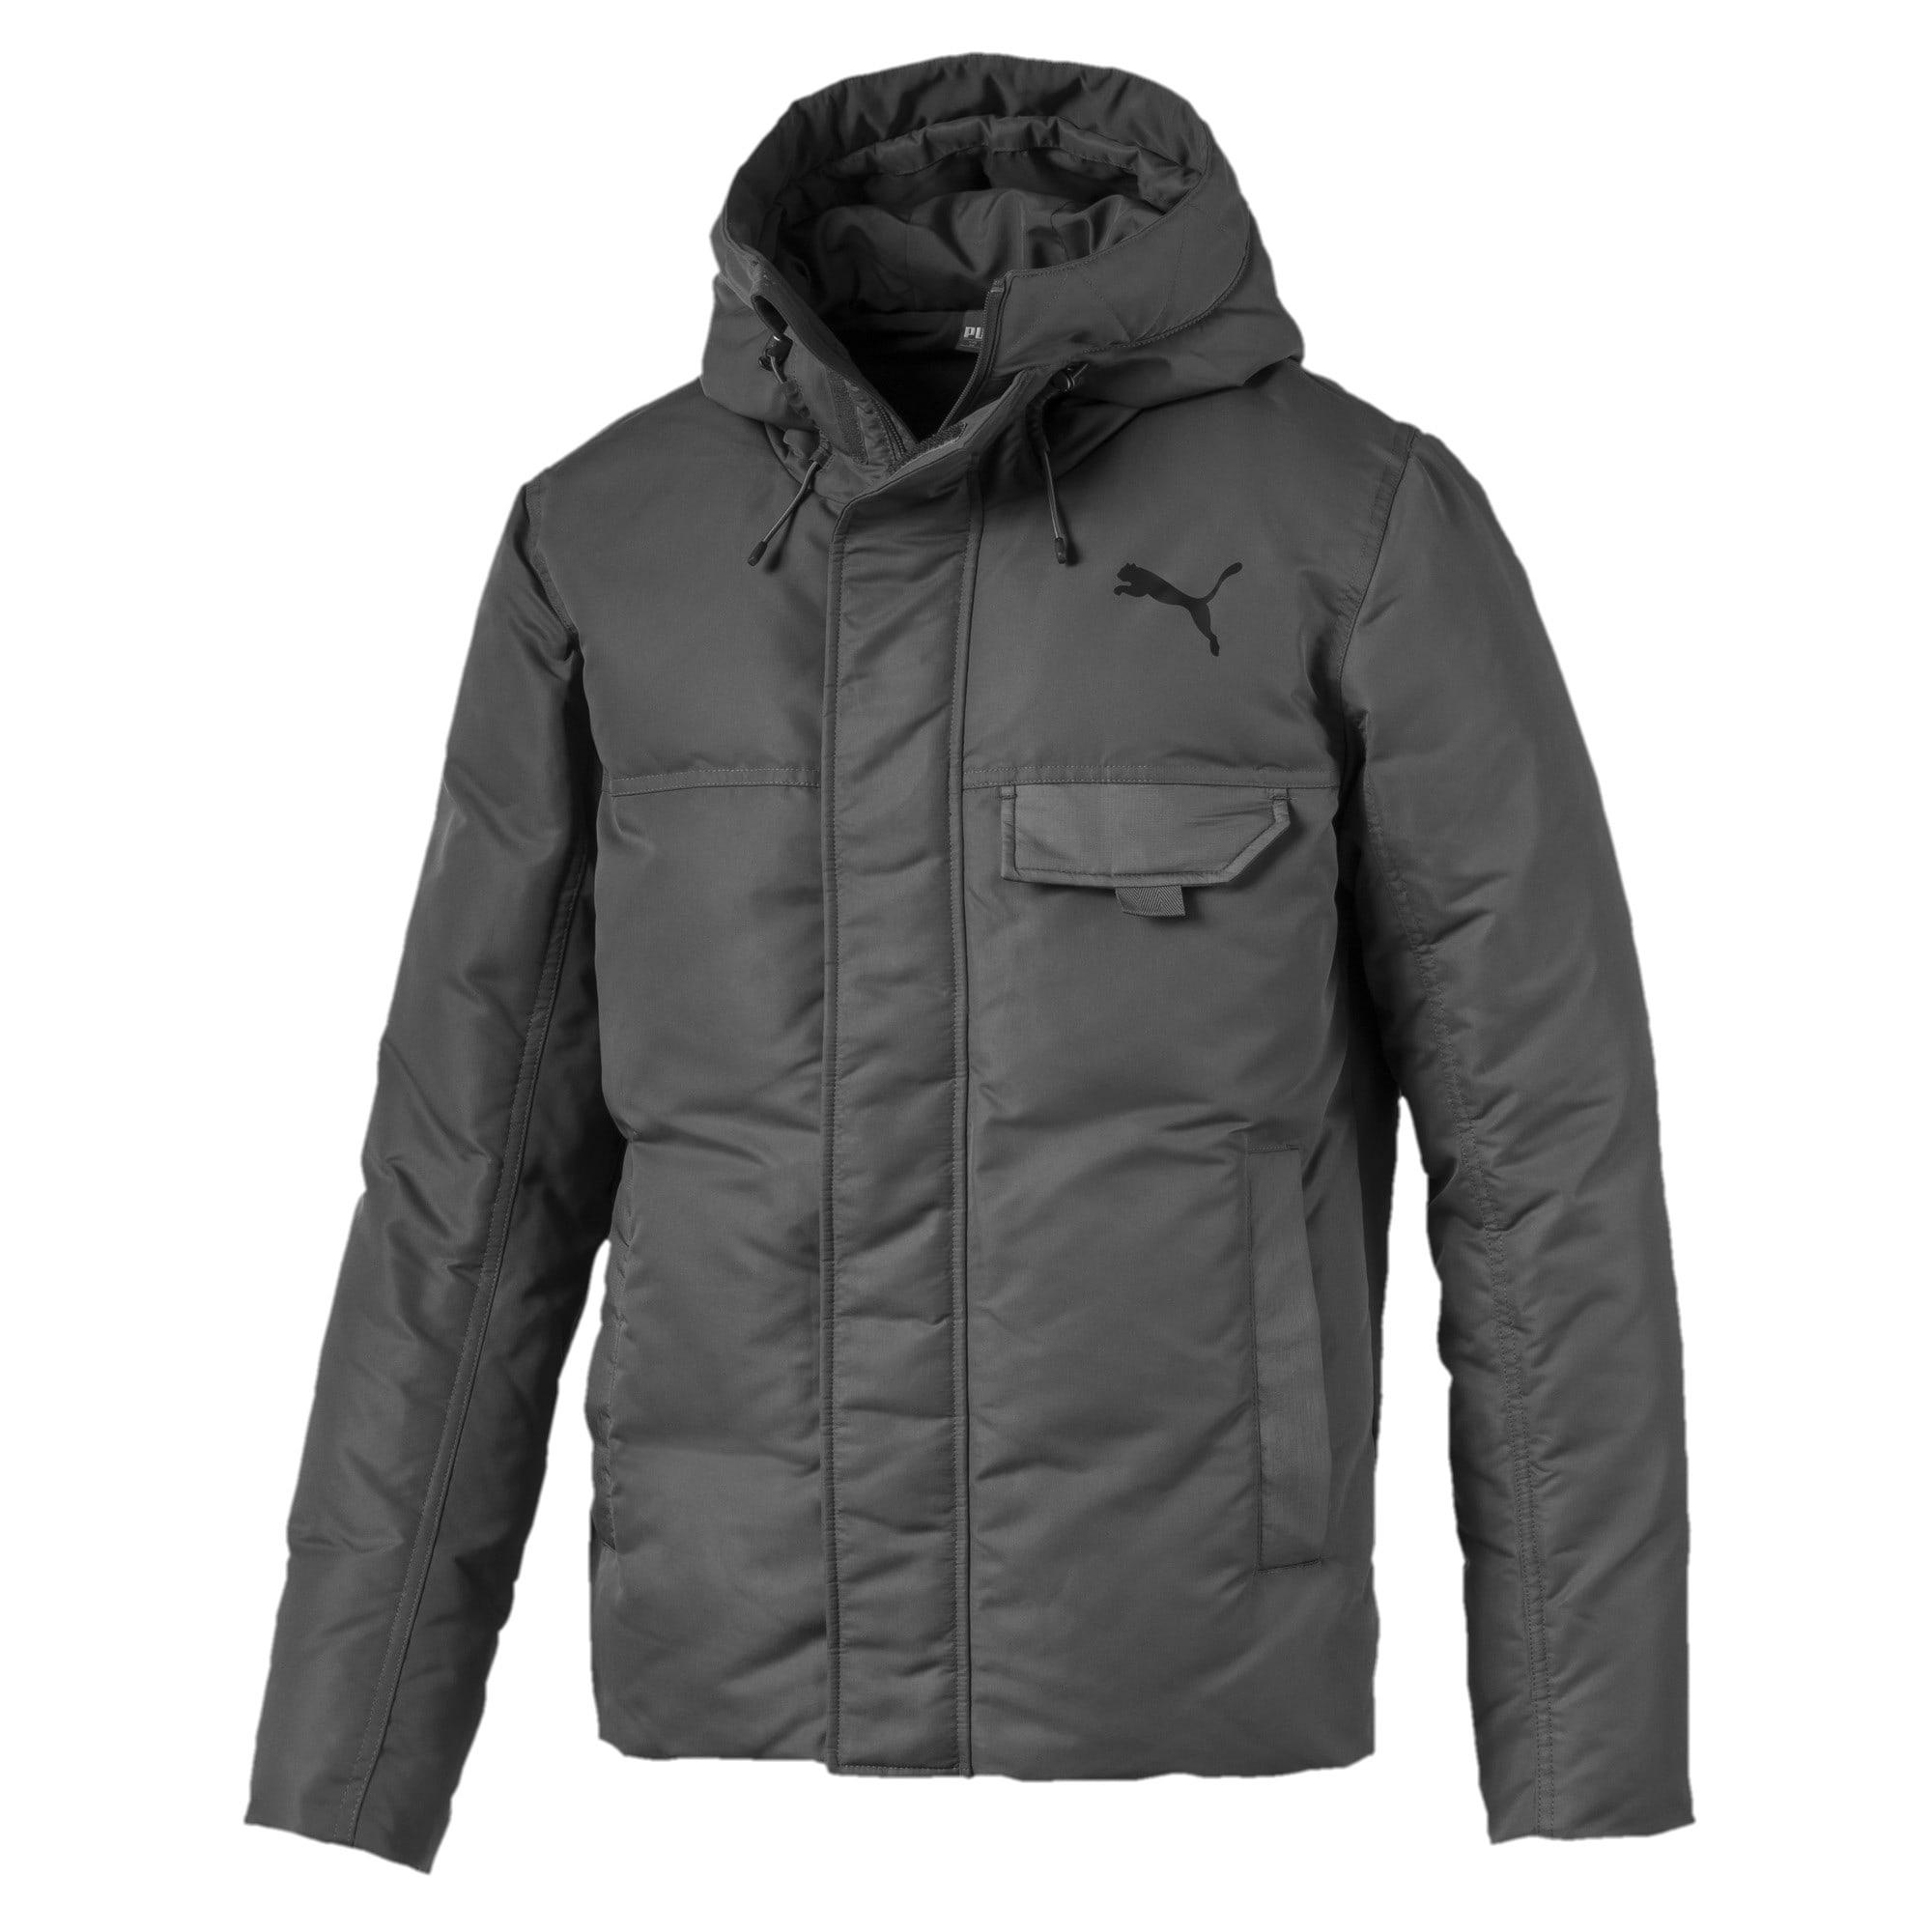 Thumbnail 4 of Streetstyle 480 HD Down Men's Jacket, CASTLEROCK, medium